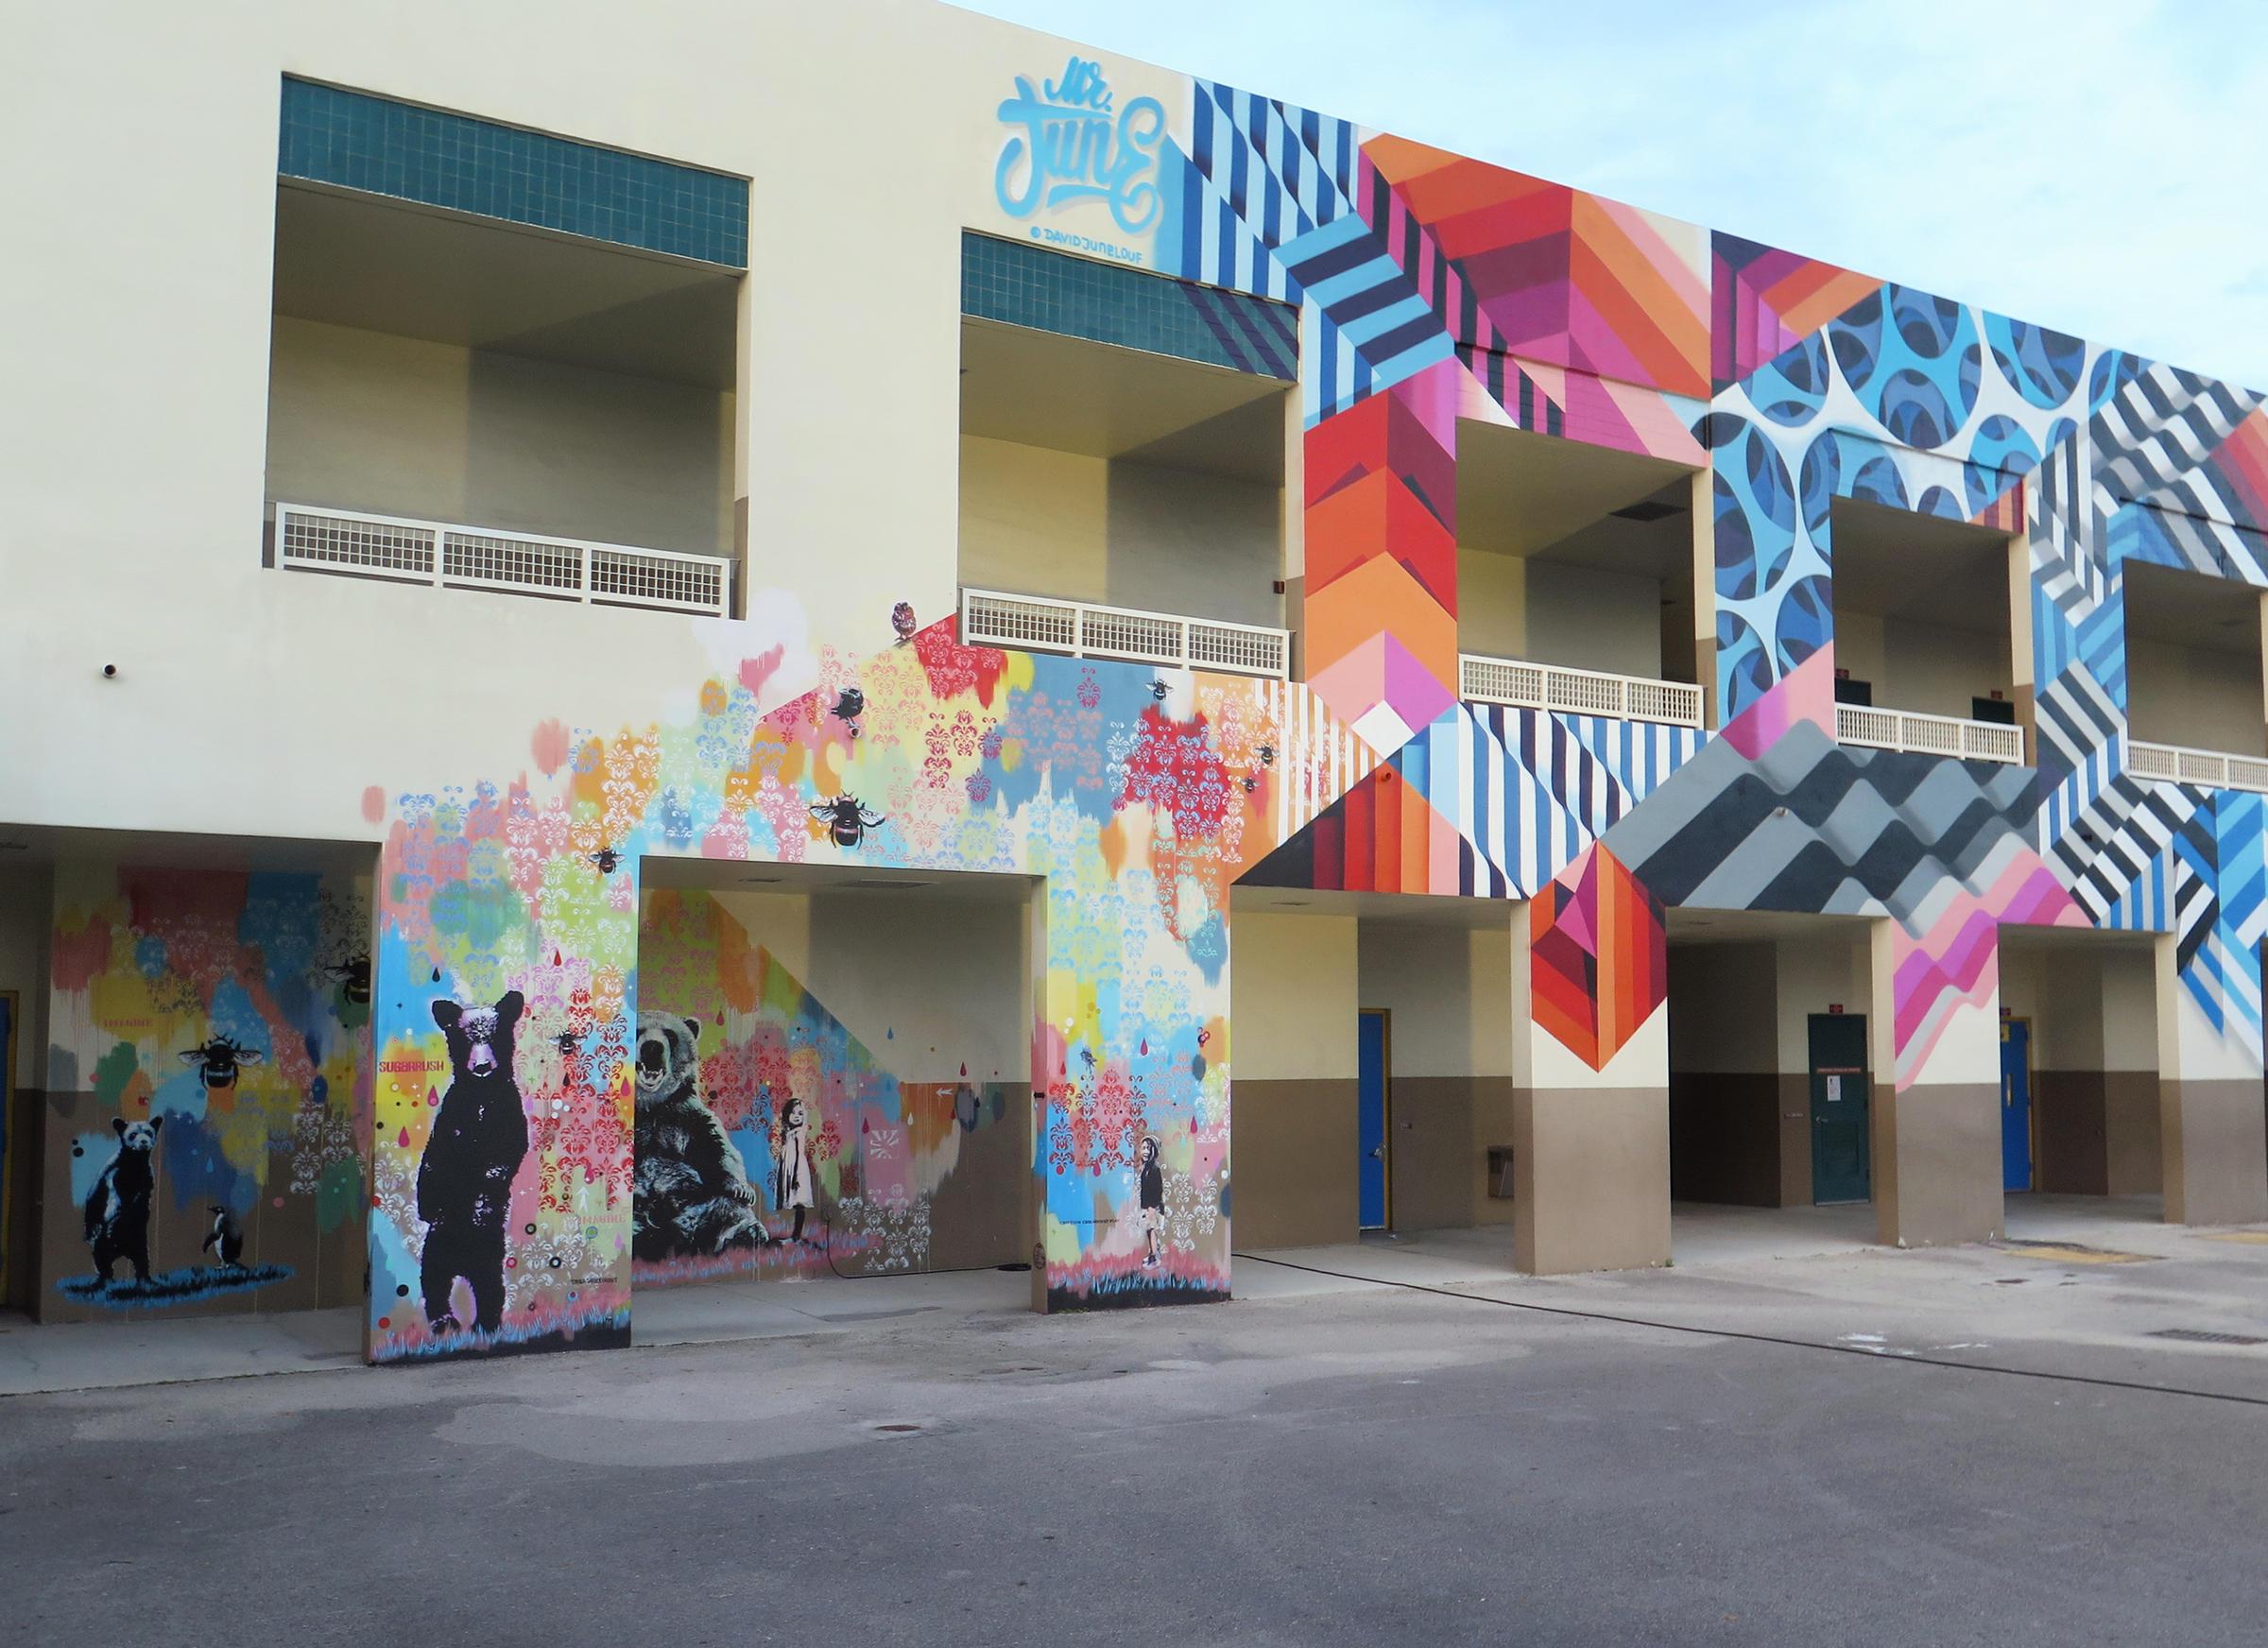 Art That Transformed A Miami Neighborhood Now Making Its Schools Cool | KGOU